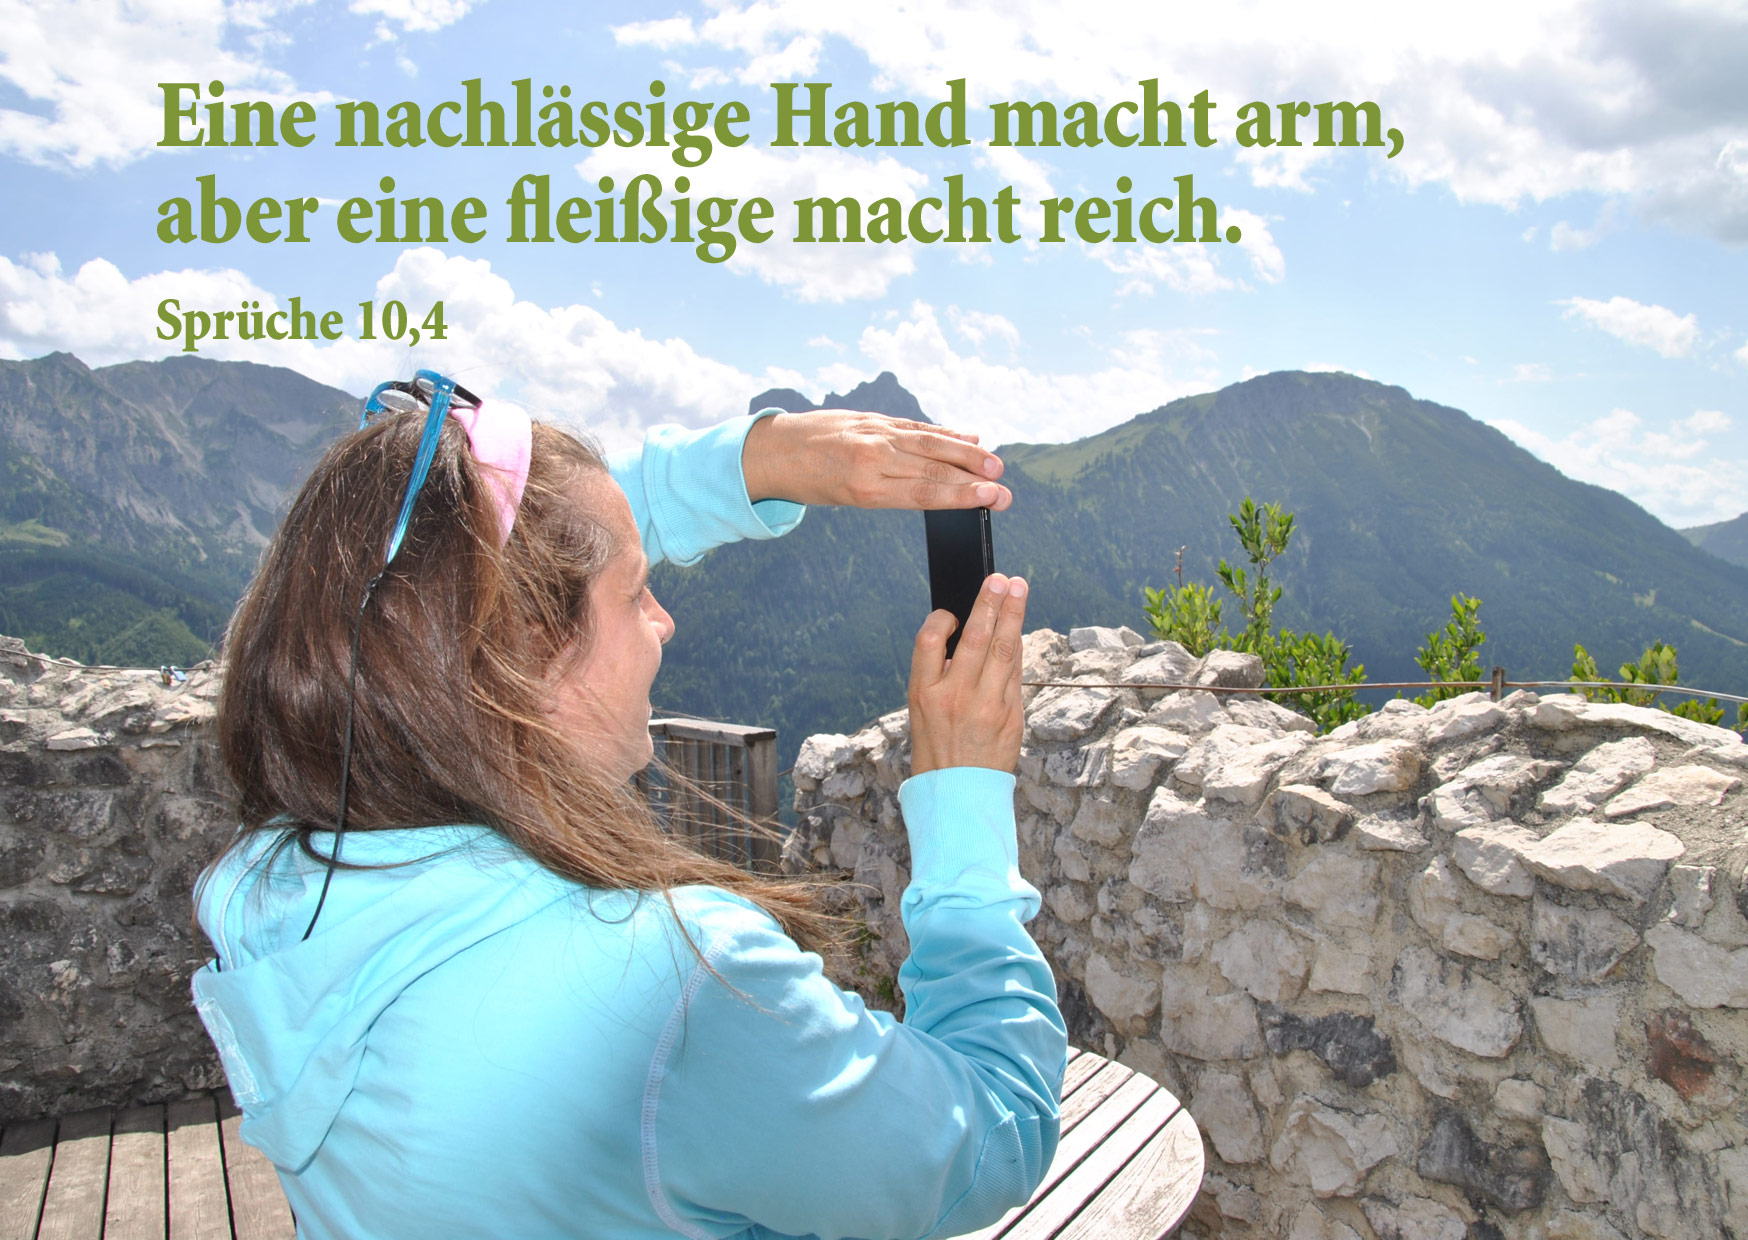 Bibelzitat für jeden Tag, Sprüche 10,4, Bibelzitat, Foto: Christine Danzer, go 4 Jesus